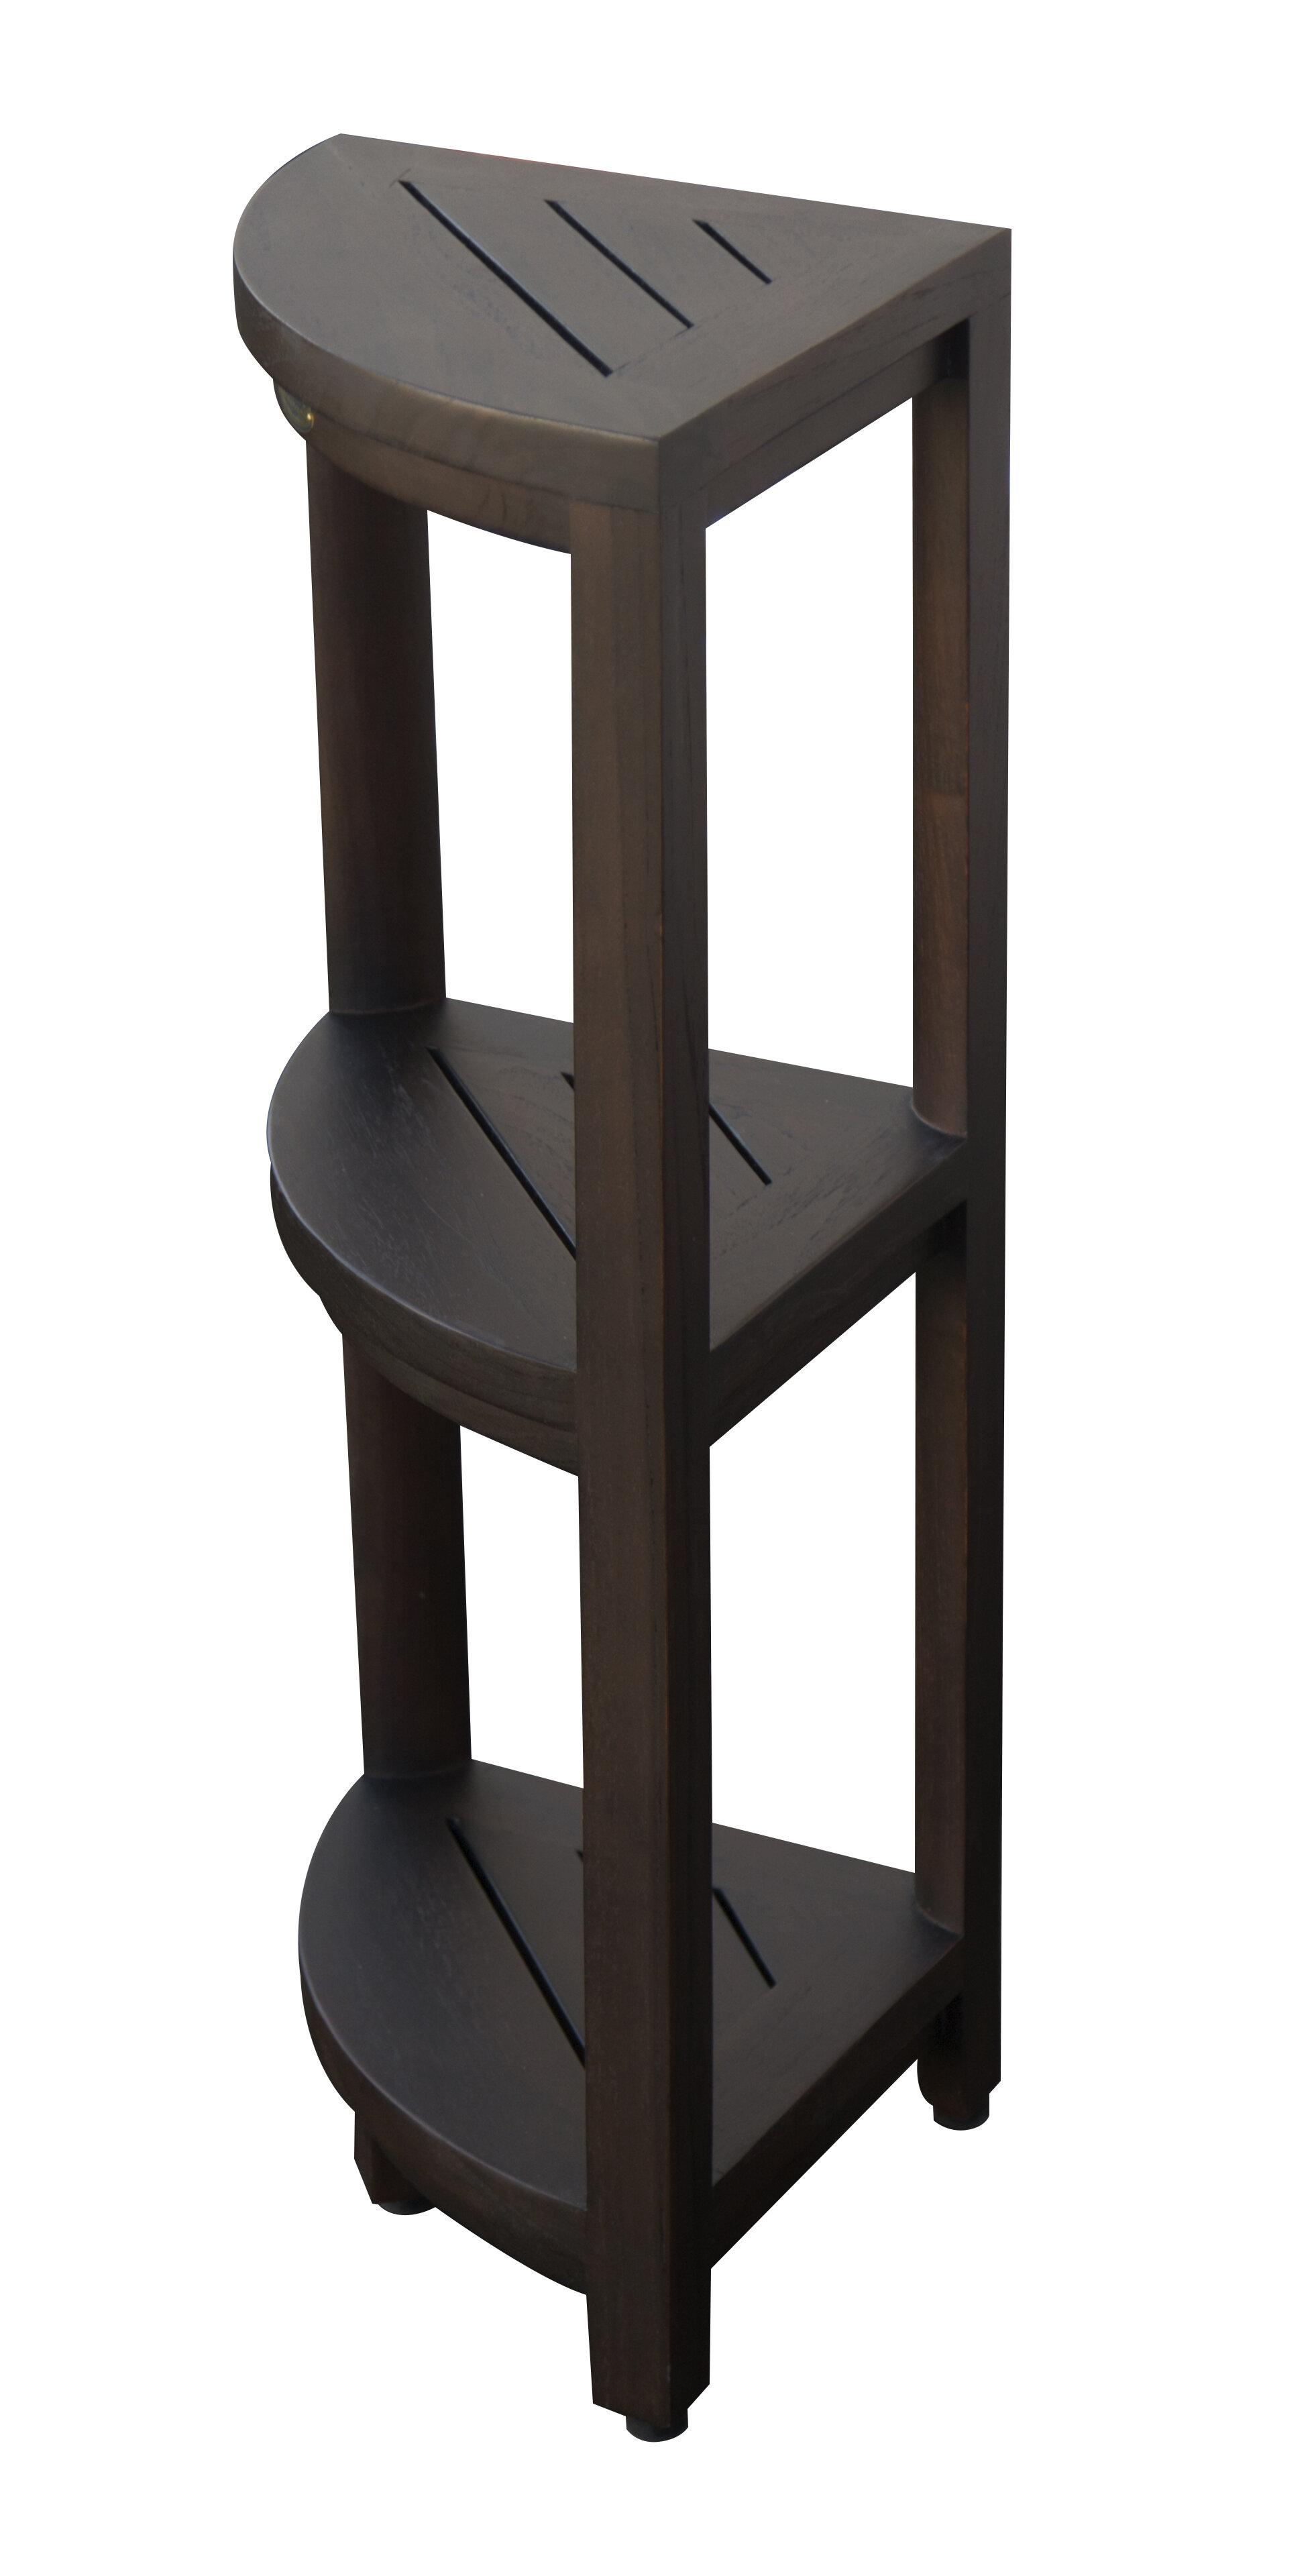 Decoteak Classic Shower Shelf U0026 Reviews | Wayfair